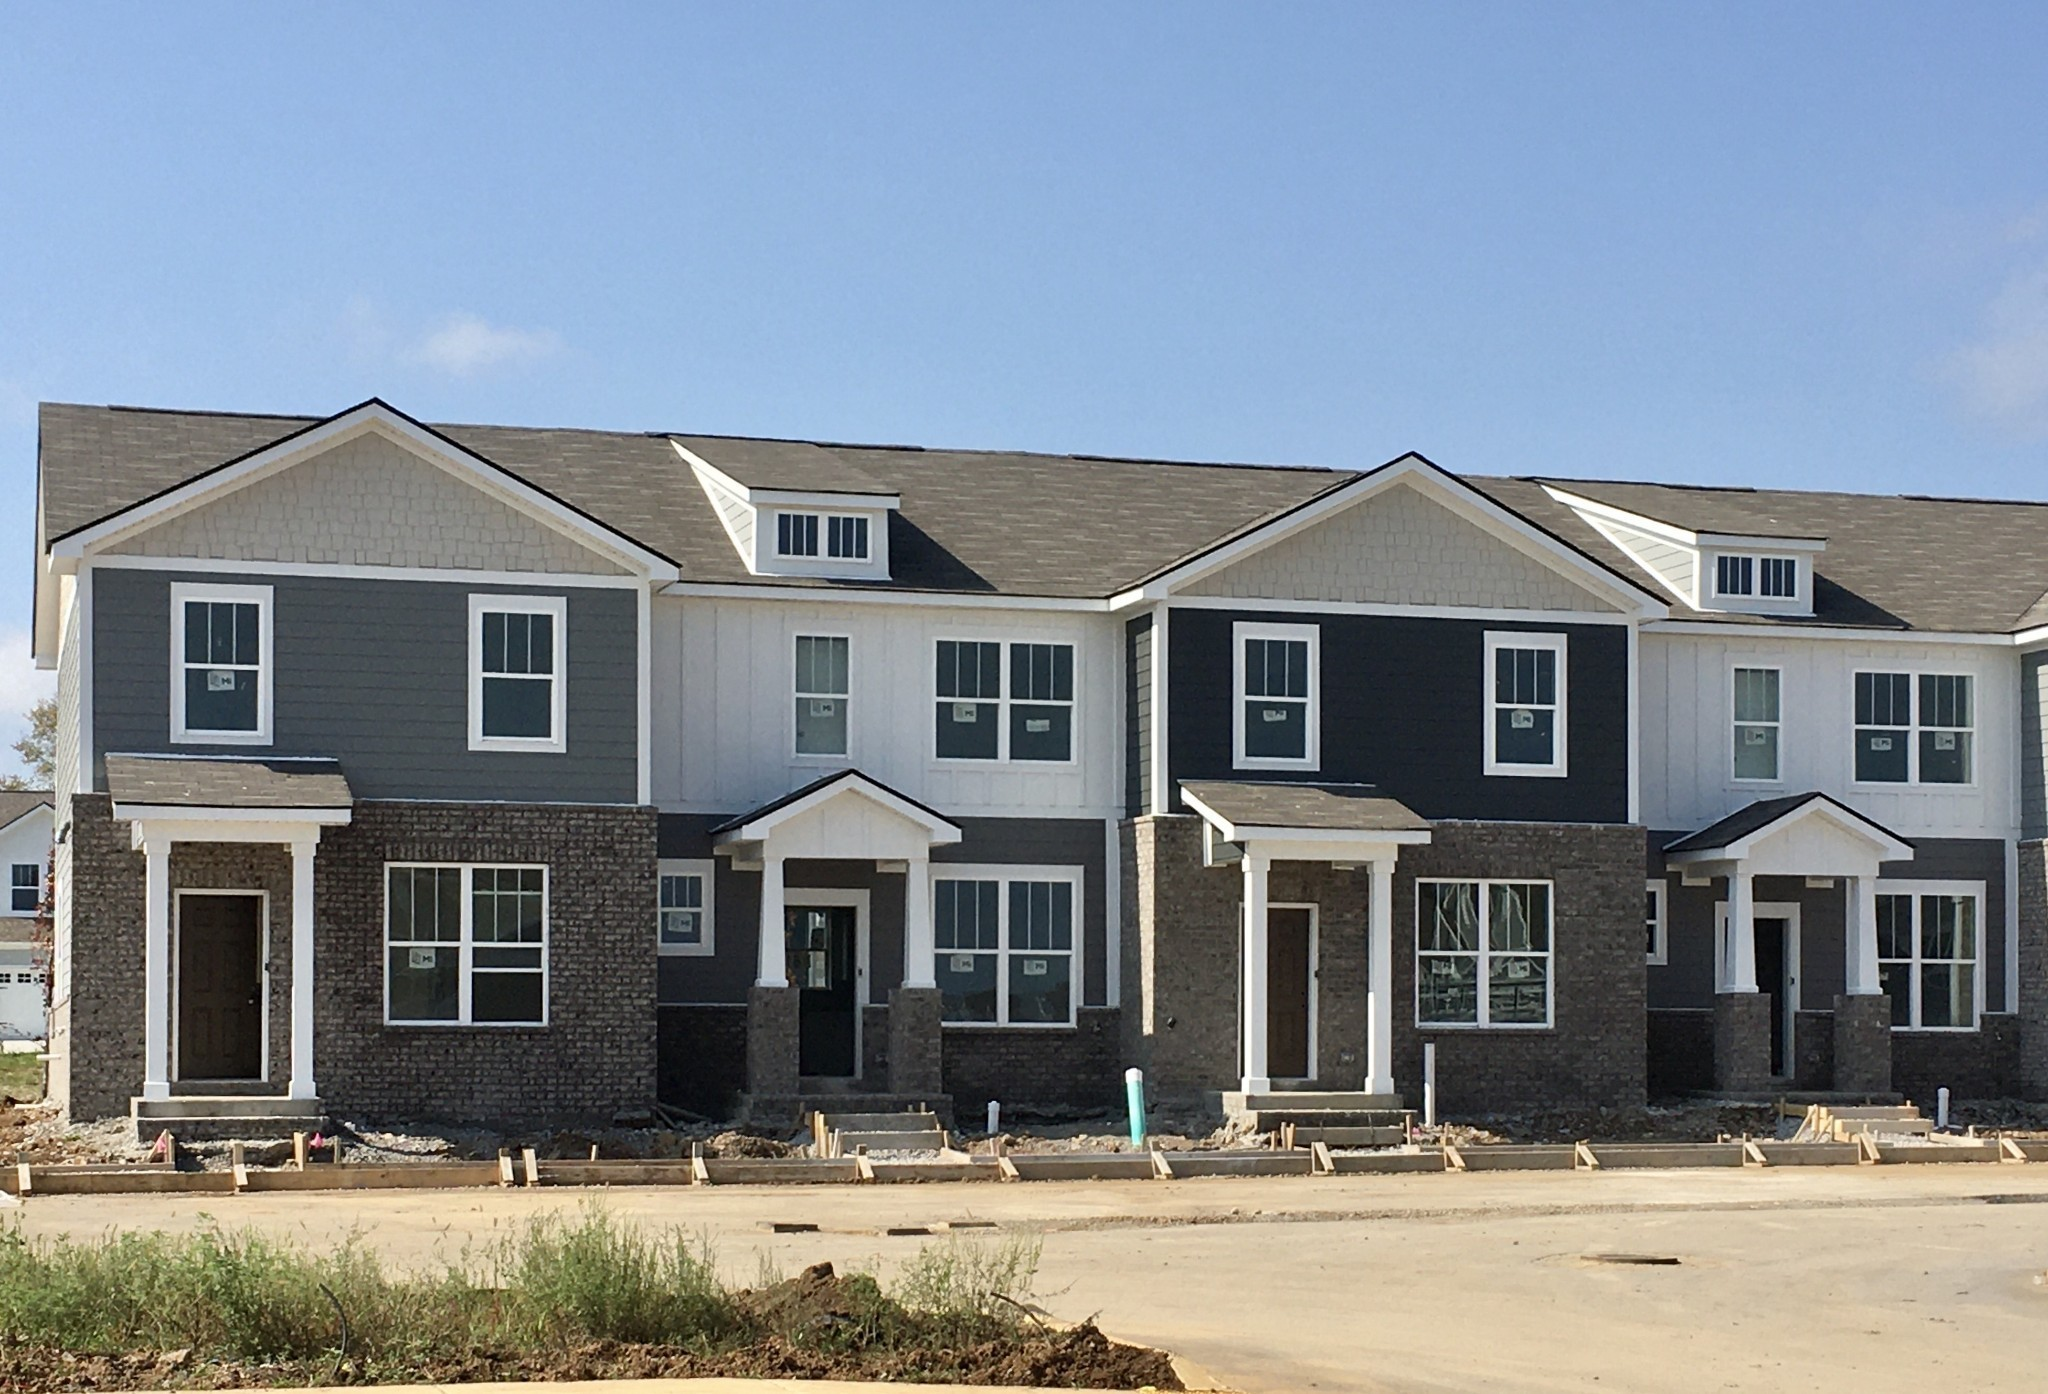 1719 Frodo Way (87) Property Photo - Murfreesboro, TN real estate listing